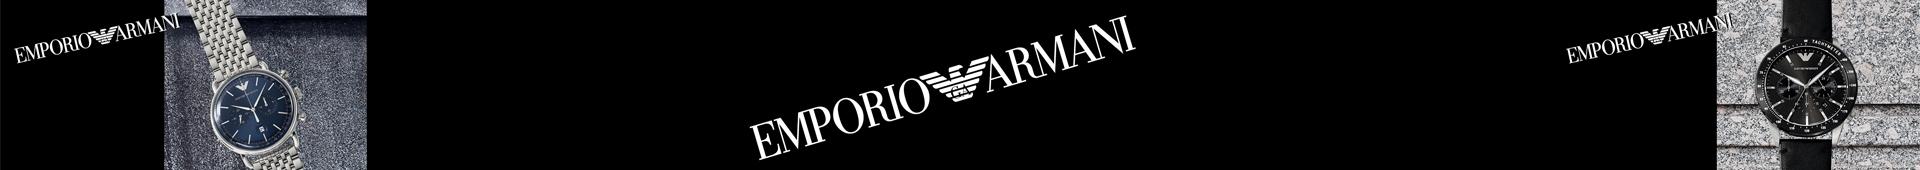 Emporio Armani Connected